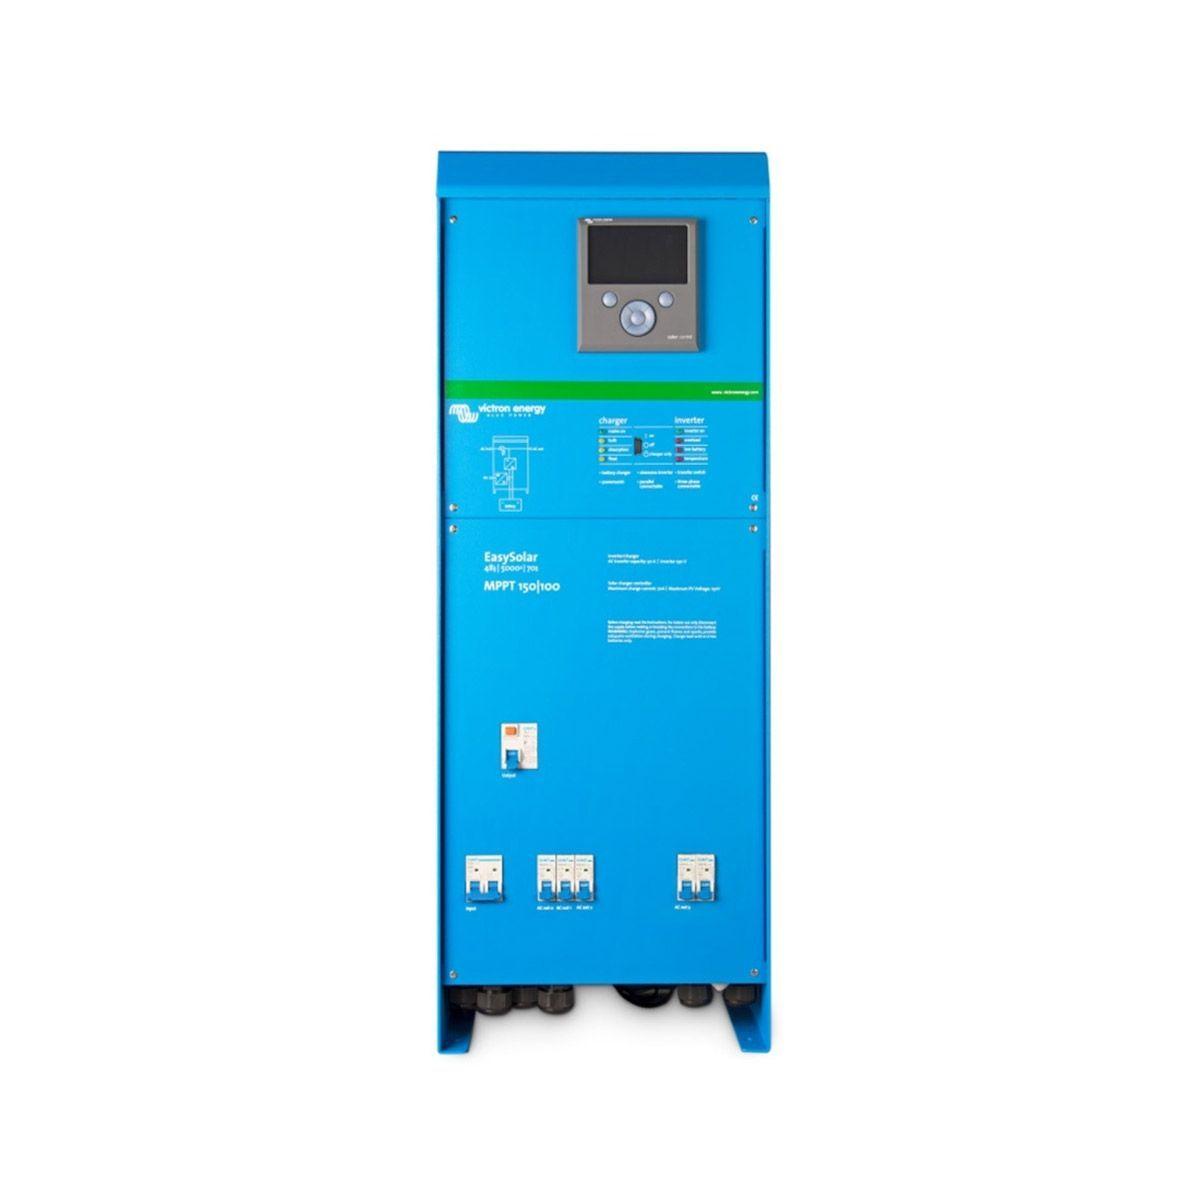 Easysolar 48 5000 35-50 MPPT 150 100 Color Control